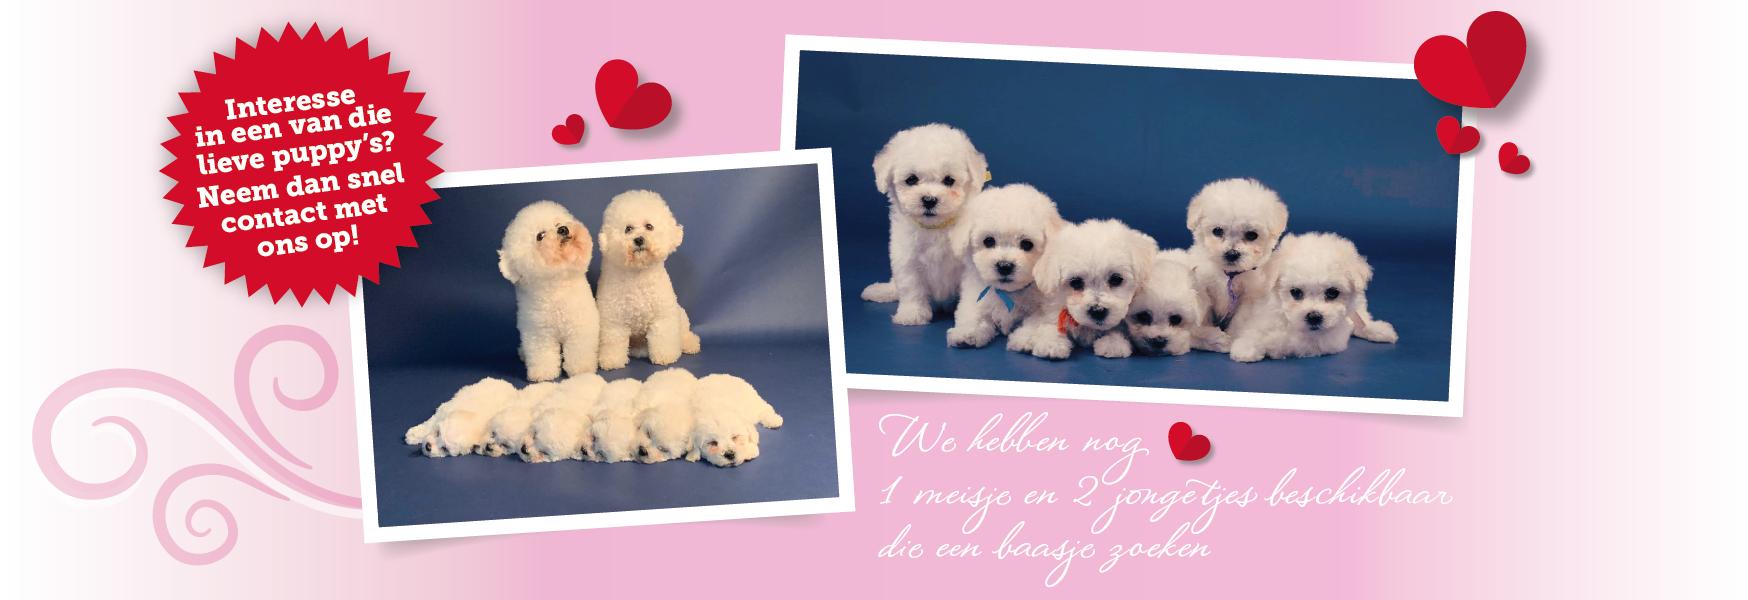 Bichonfrise-slider-pups-28-07-2021_Tekengebied 1